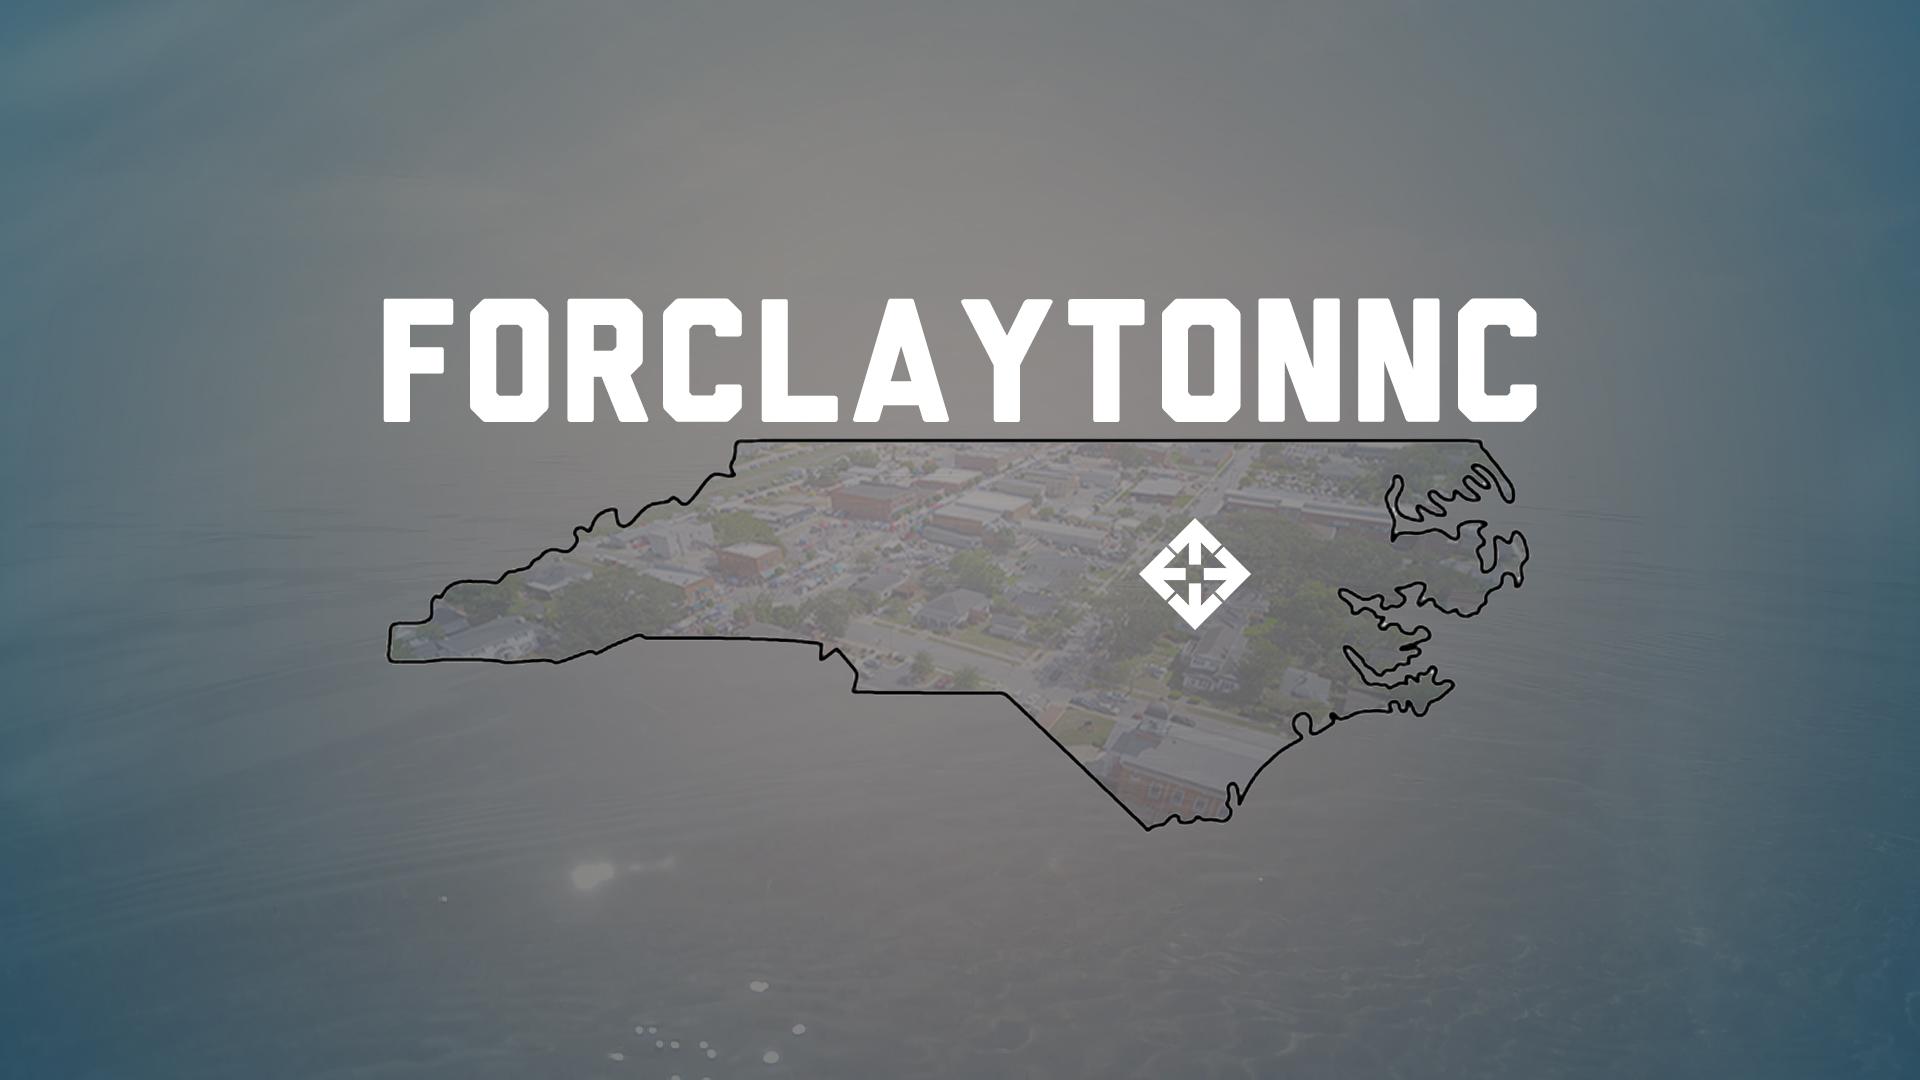 ForClaytonNc+1920x1080.jpg